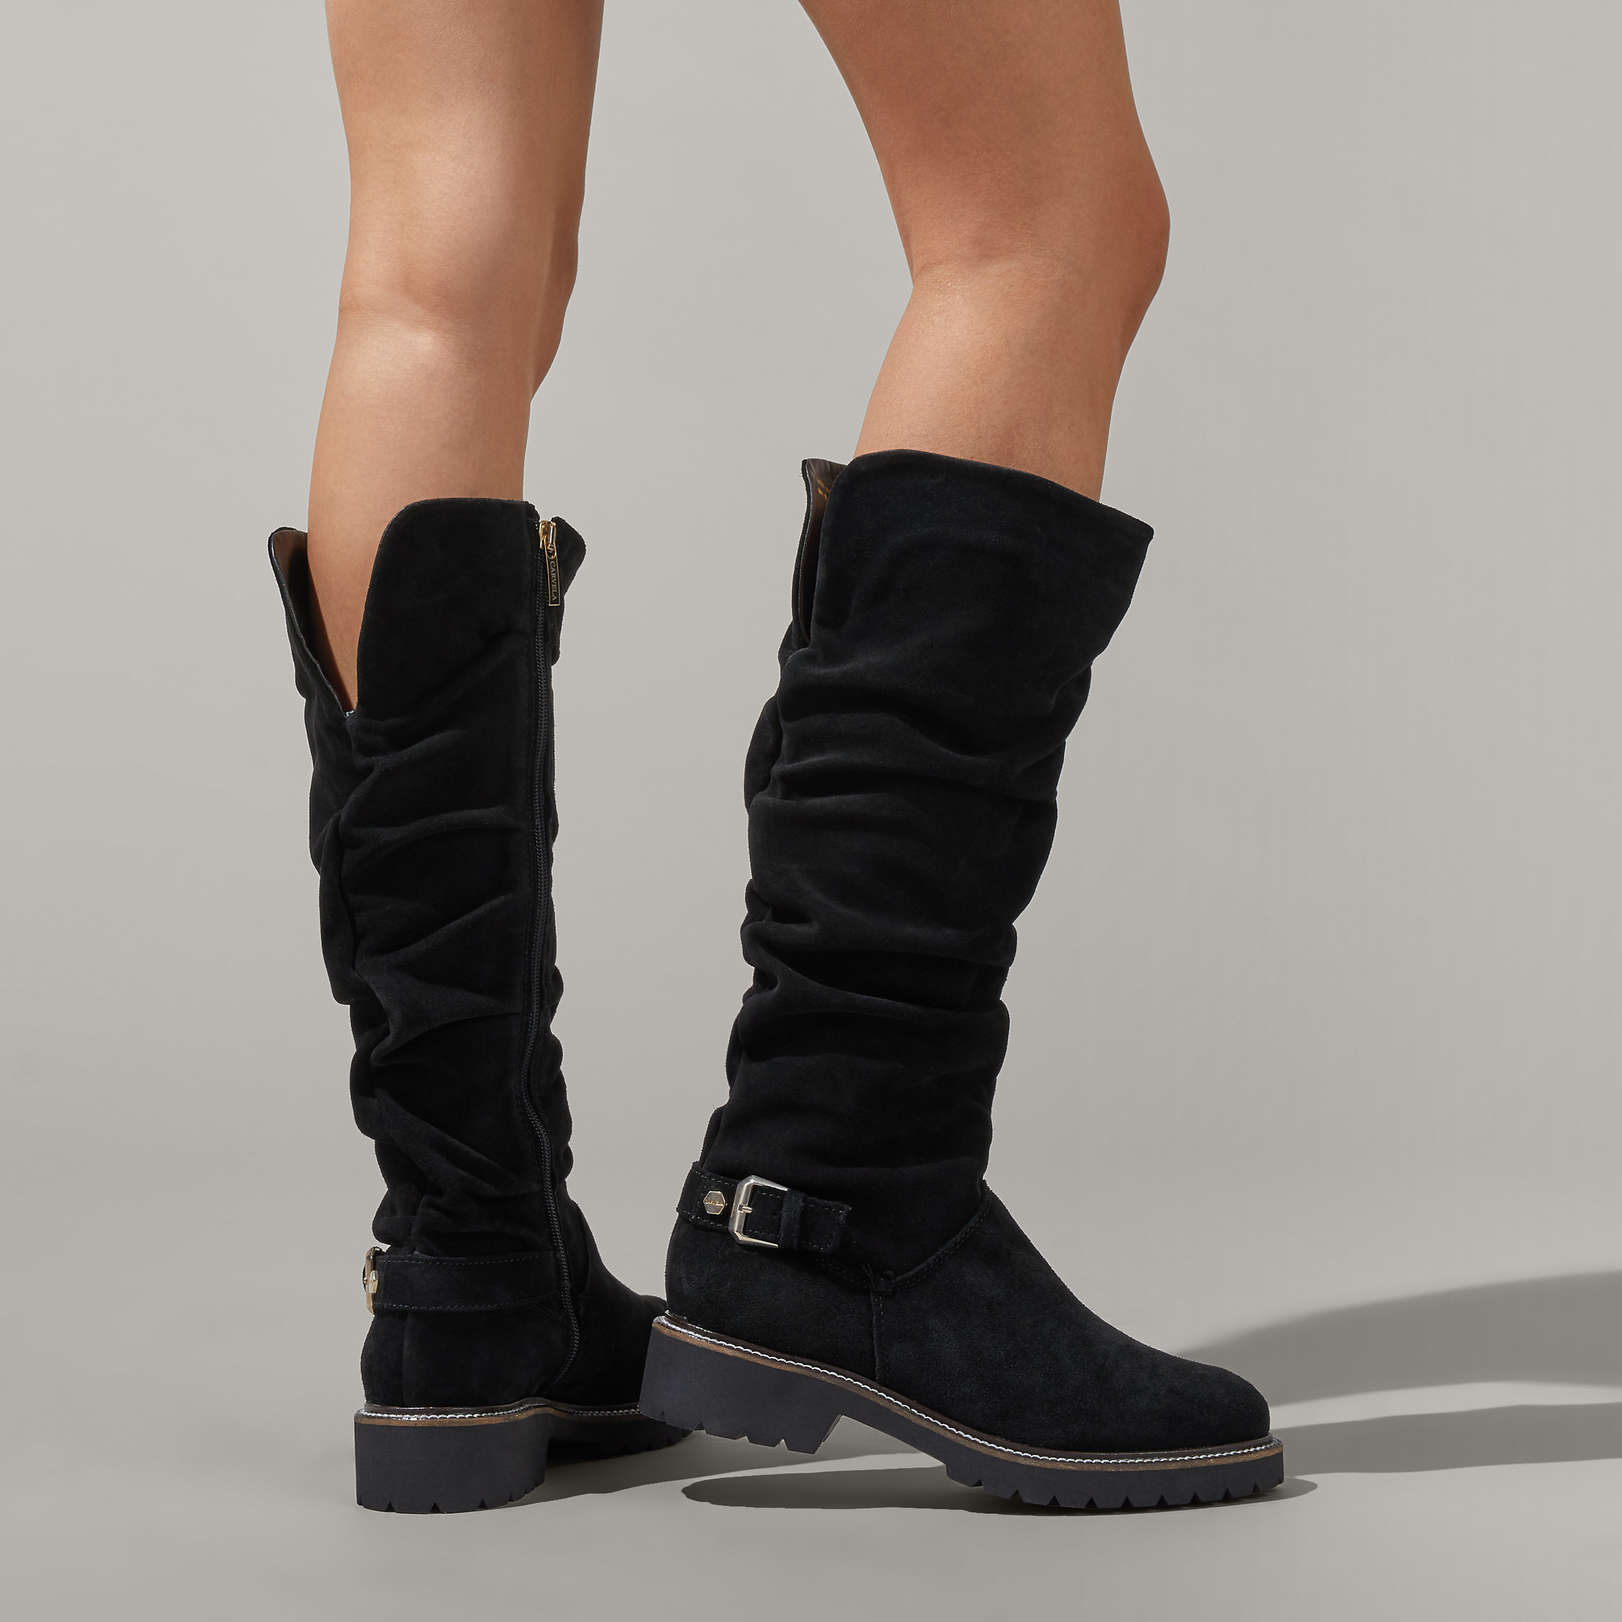 VITALITY - CARVELA COMFORT High Leg Boots